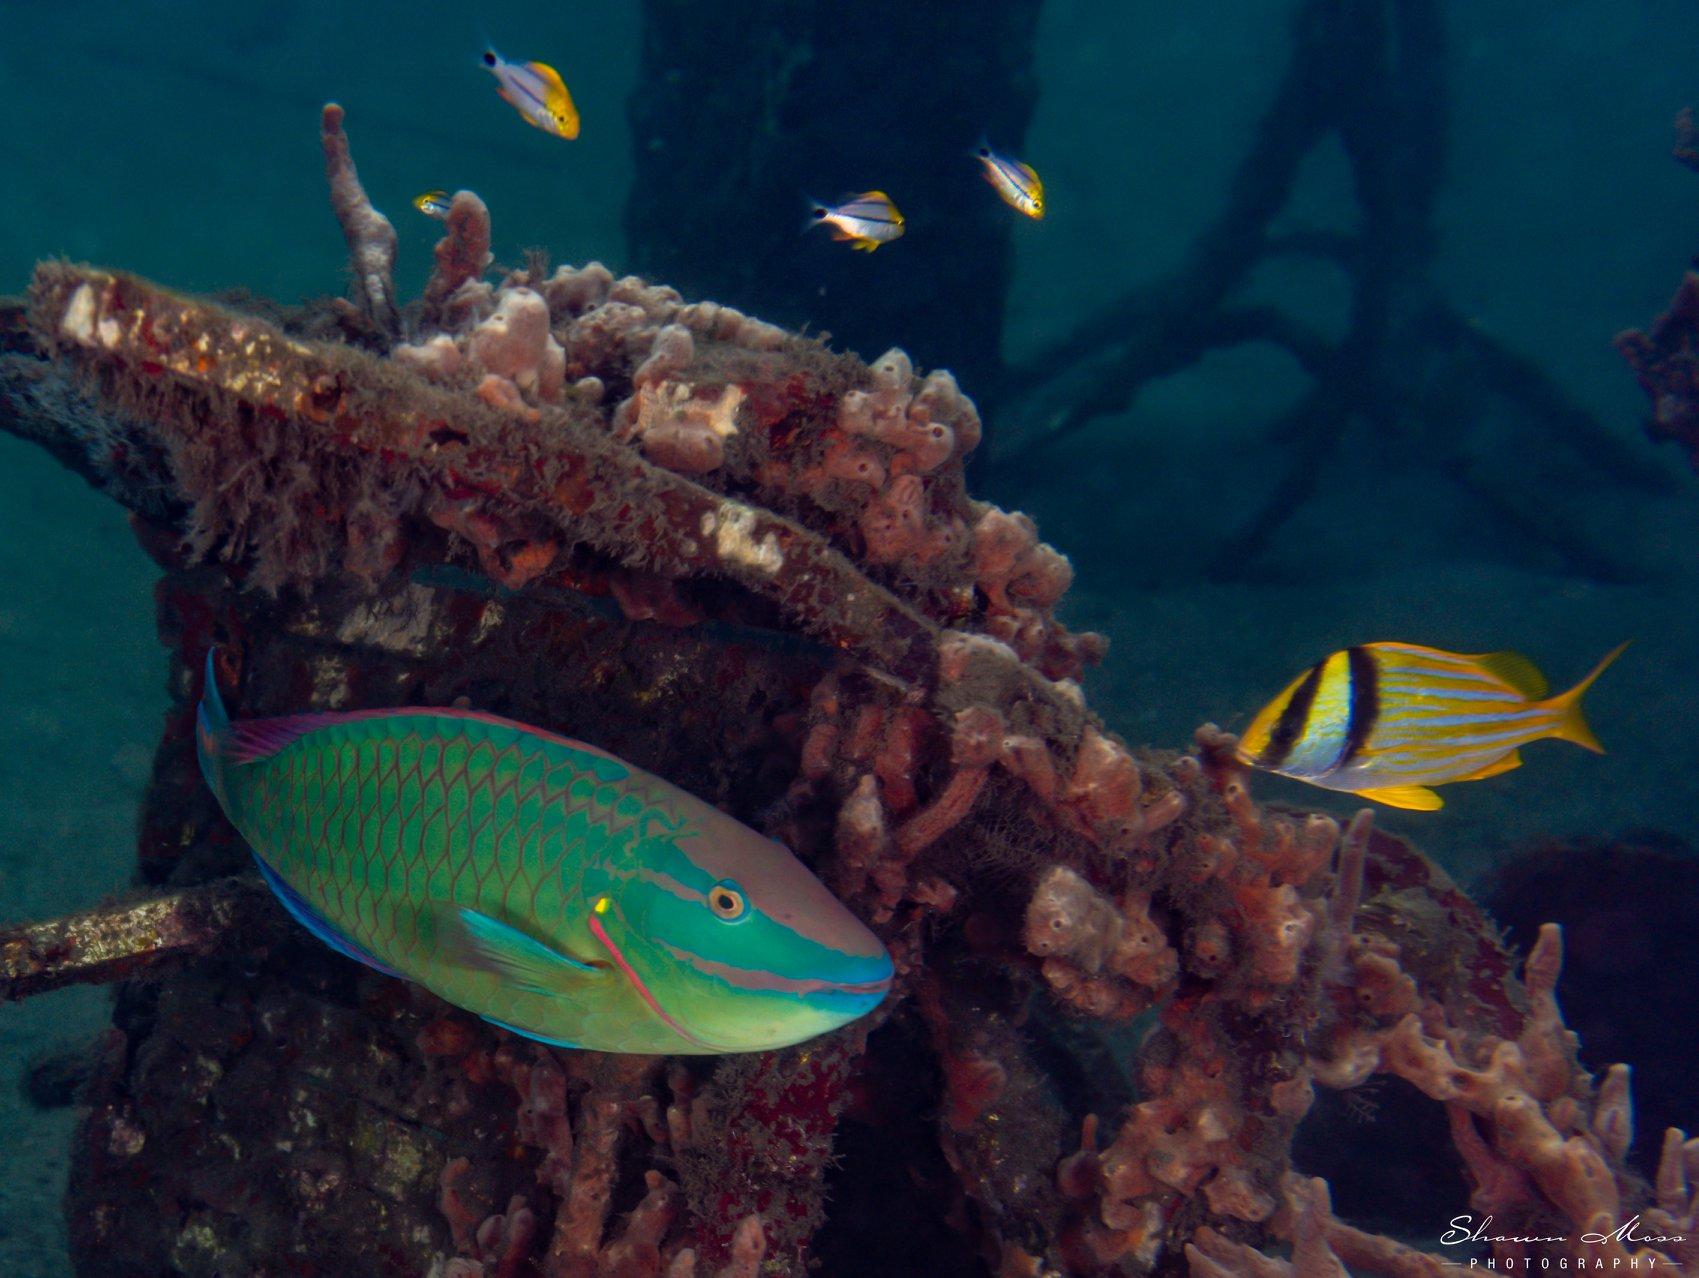 Neon aqua and yellow striped fish swim around ocean wreck